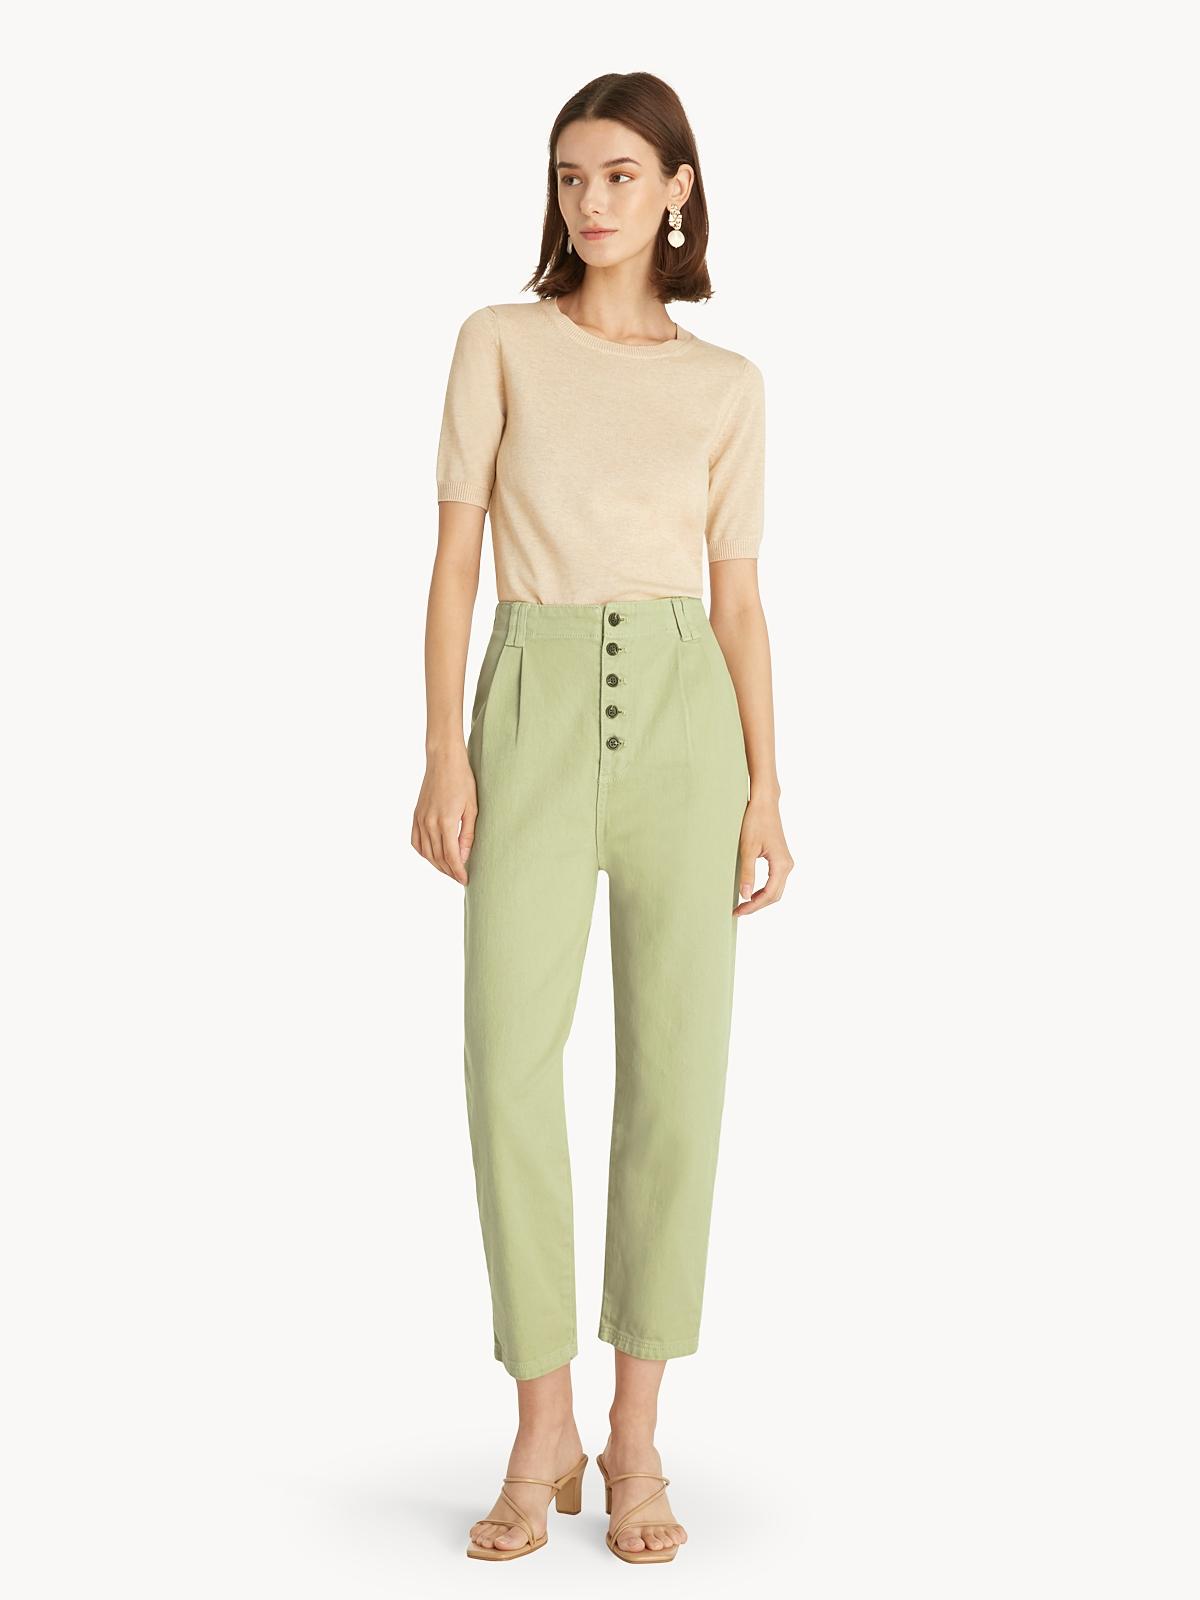 Short Sleeve Knit Top Beige